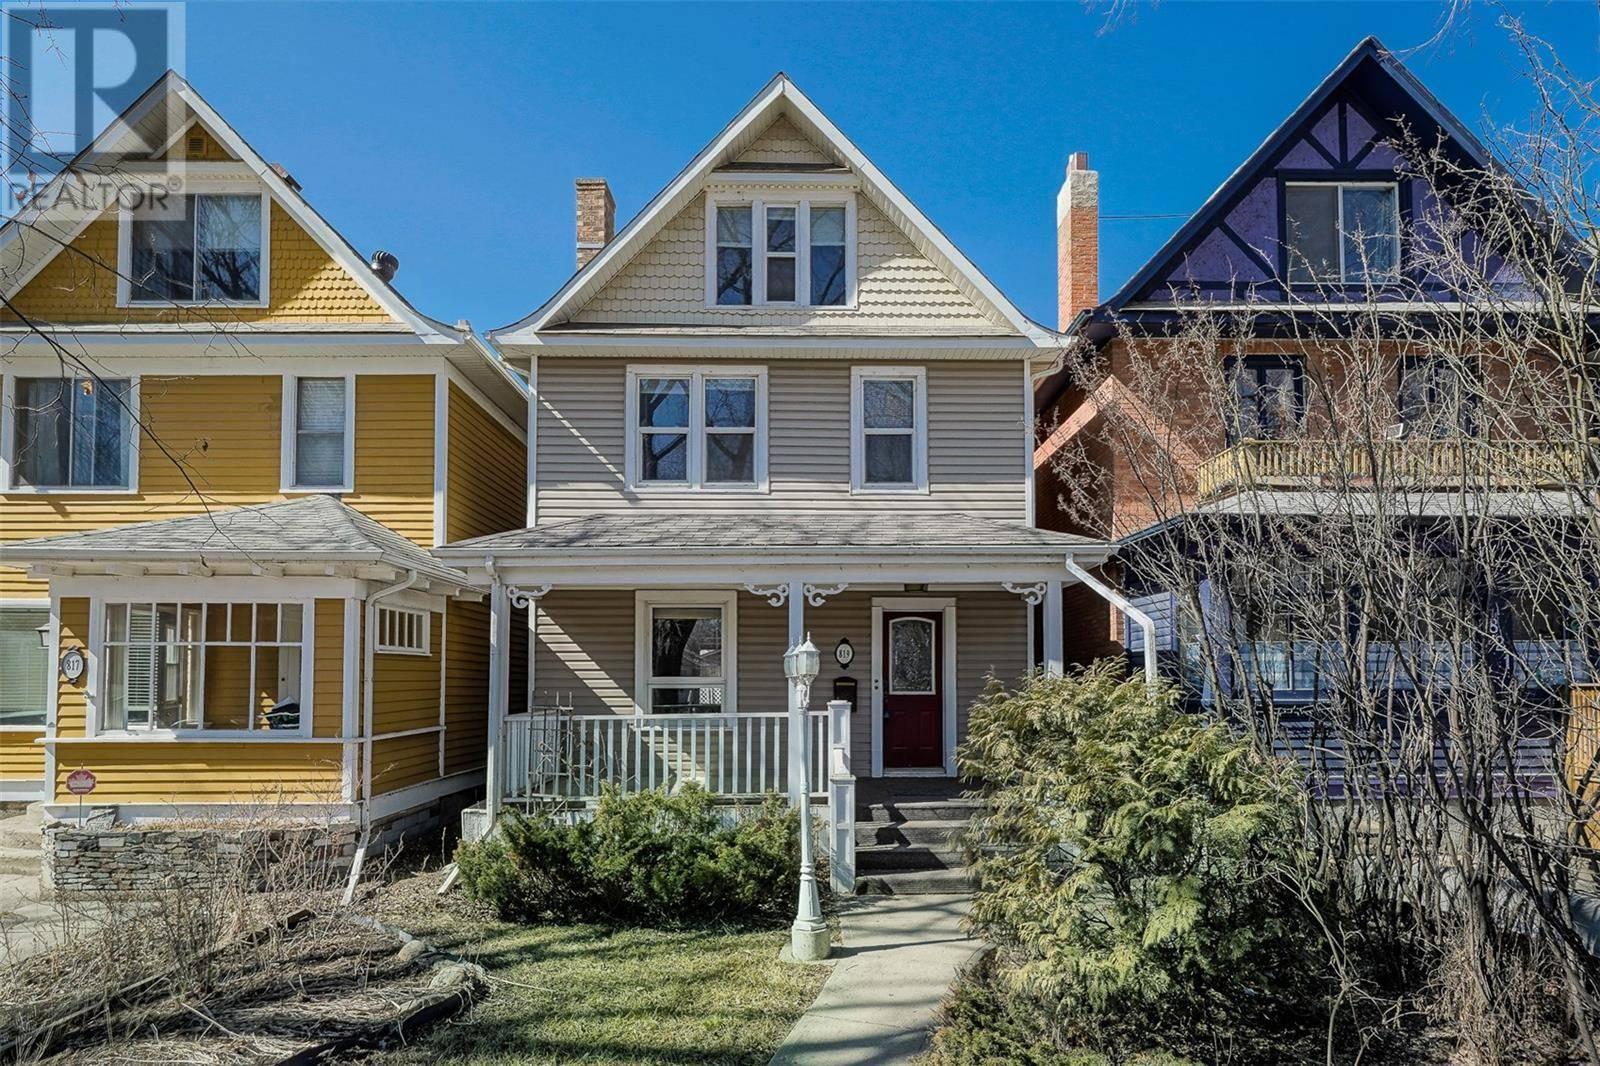 House for sale at 819 7th Ave N Saskatoon Saskatchewan - MLS: SK783194